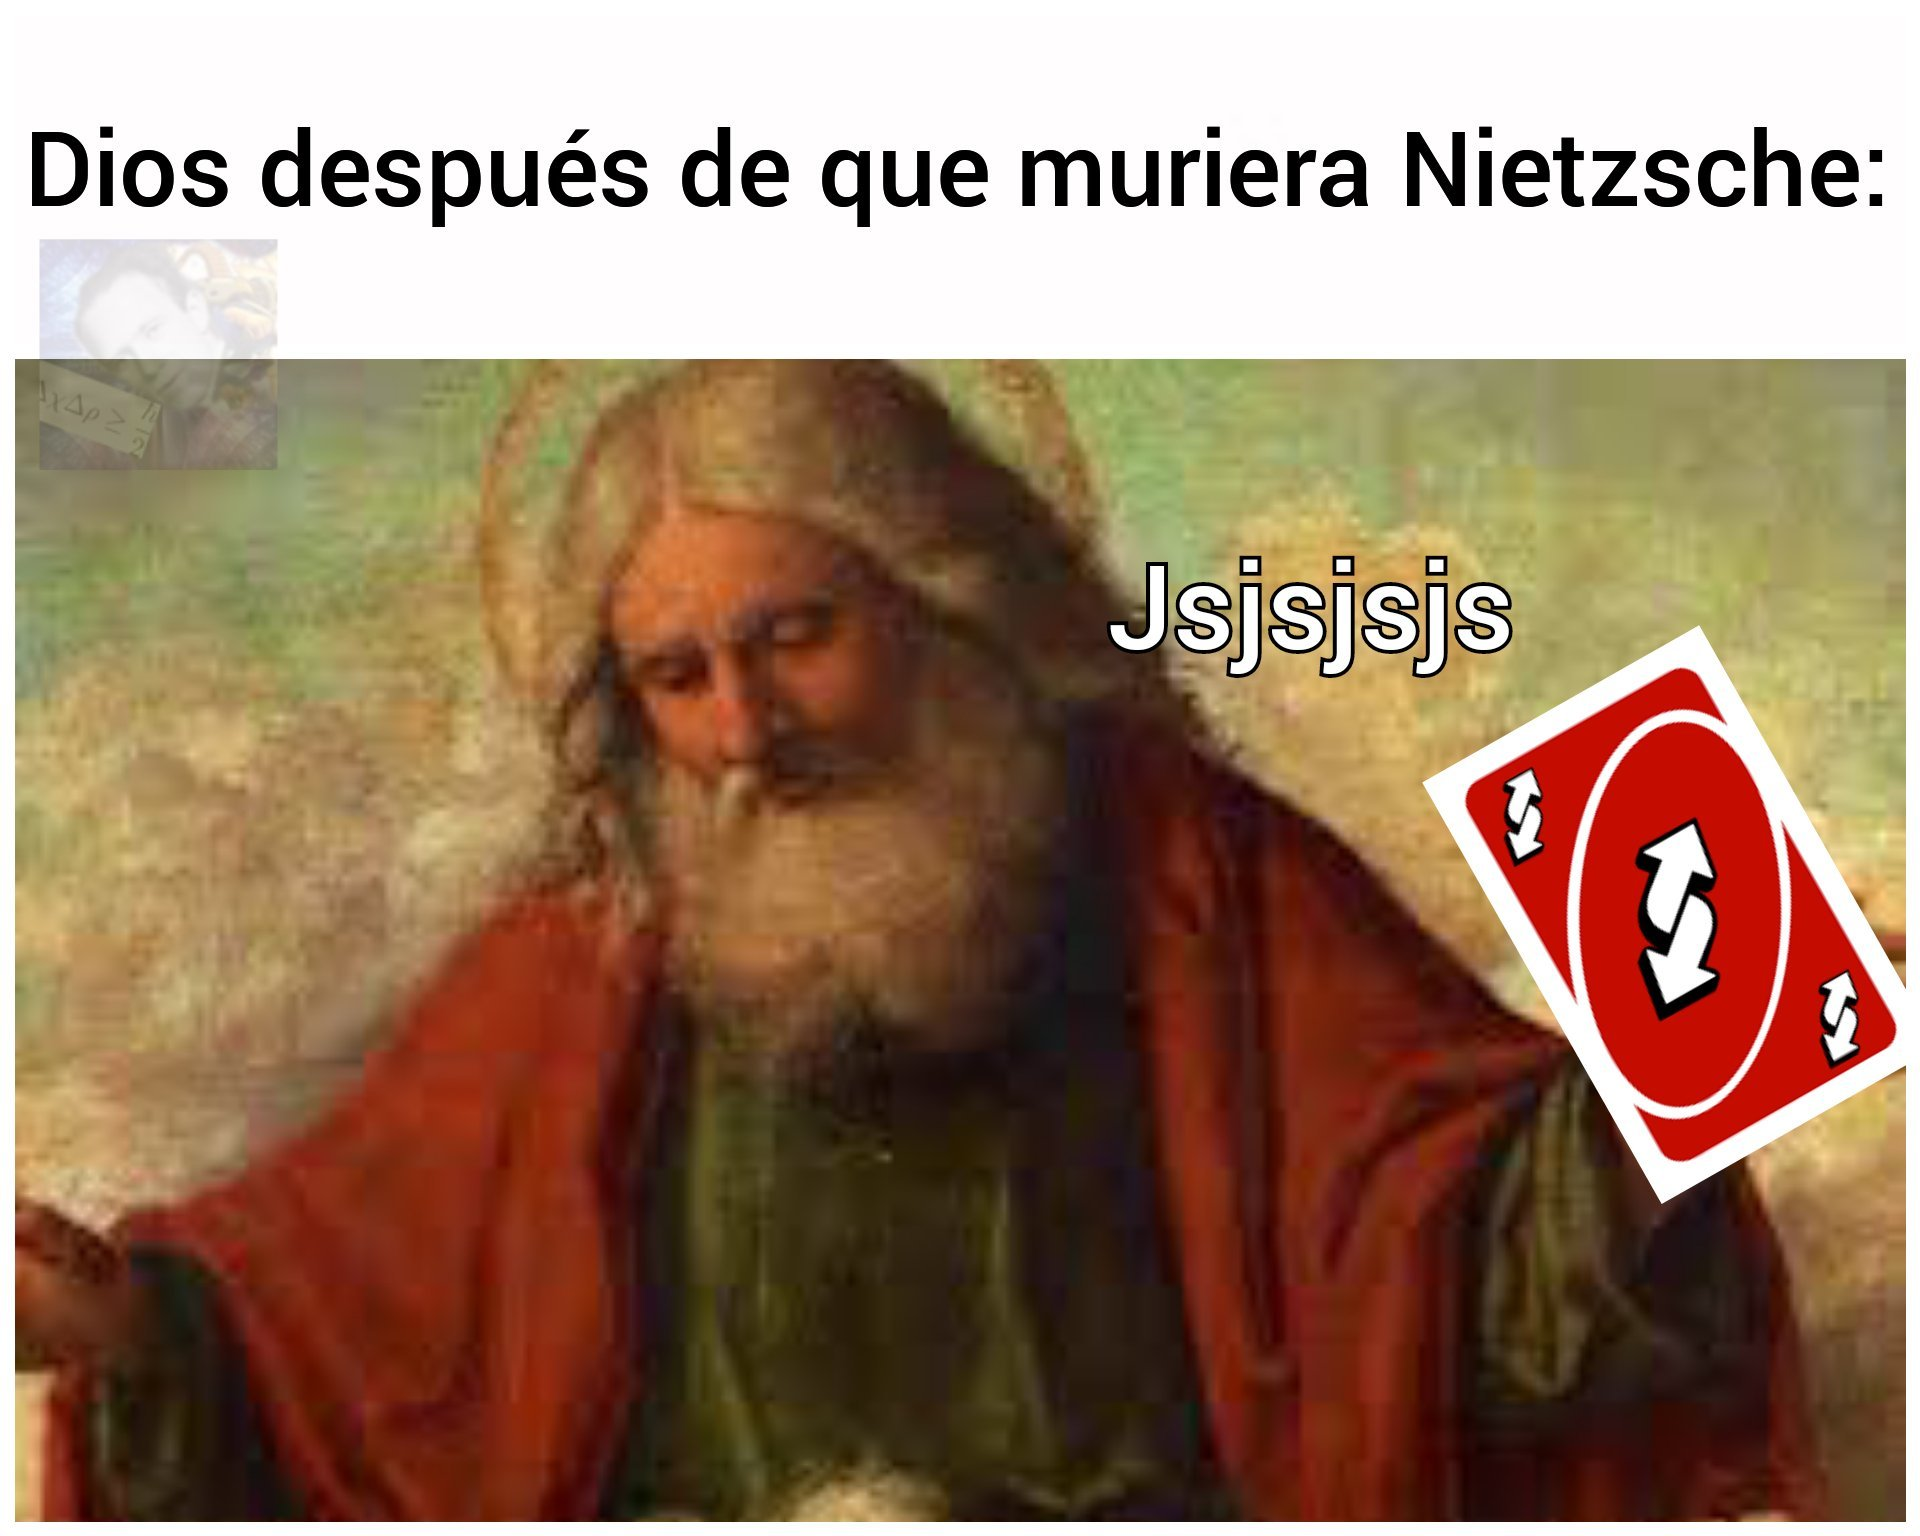 Nietzsche está muerto jsjsjsjs - meme